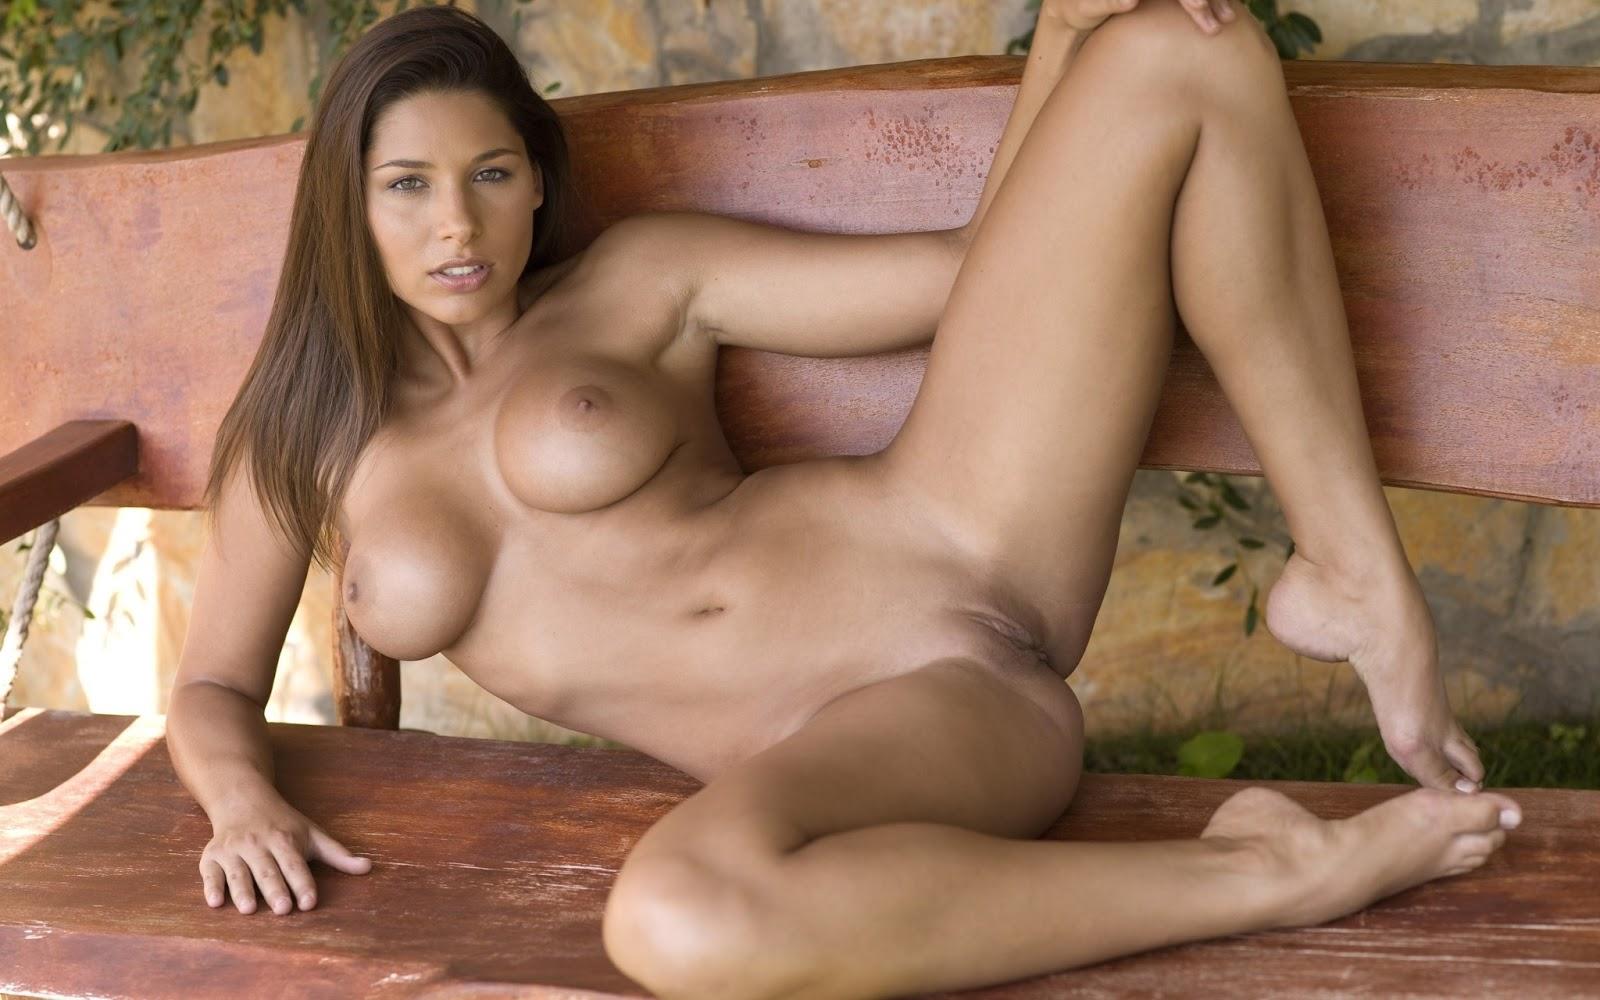 Teens naked blogspot